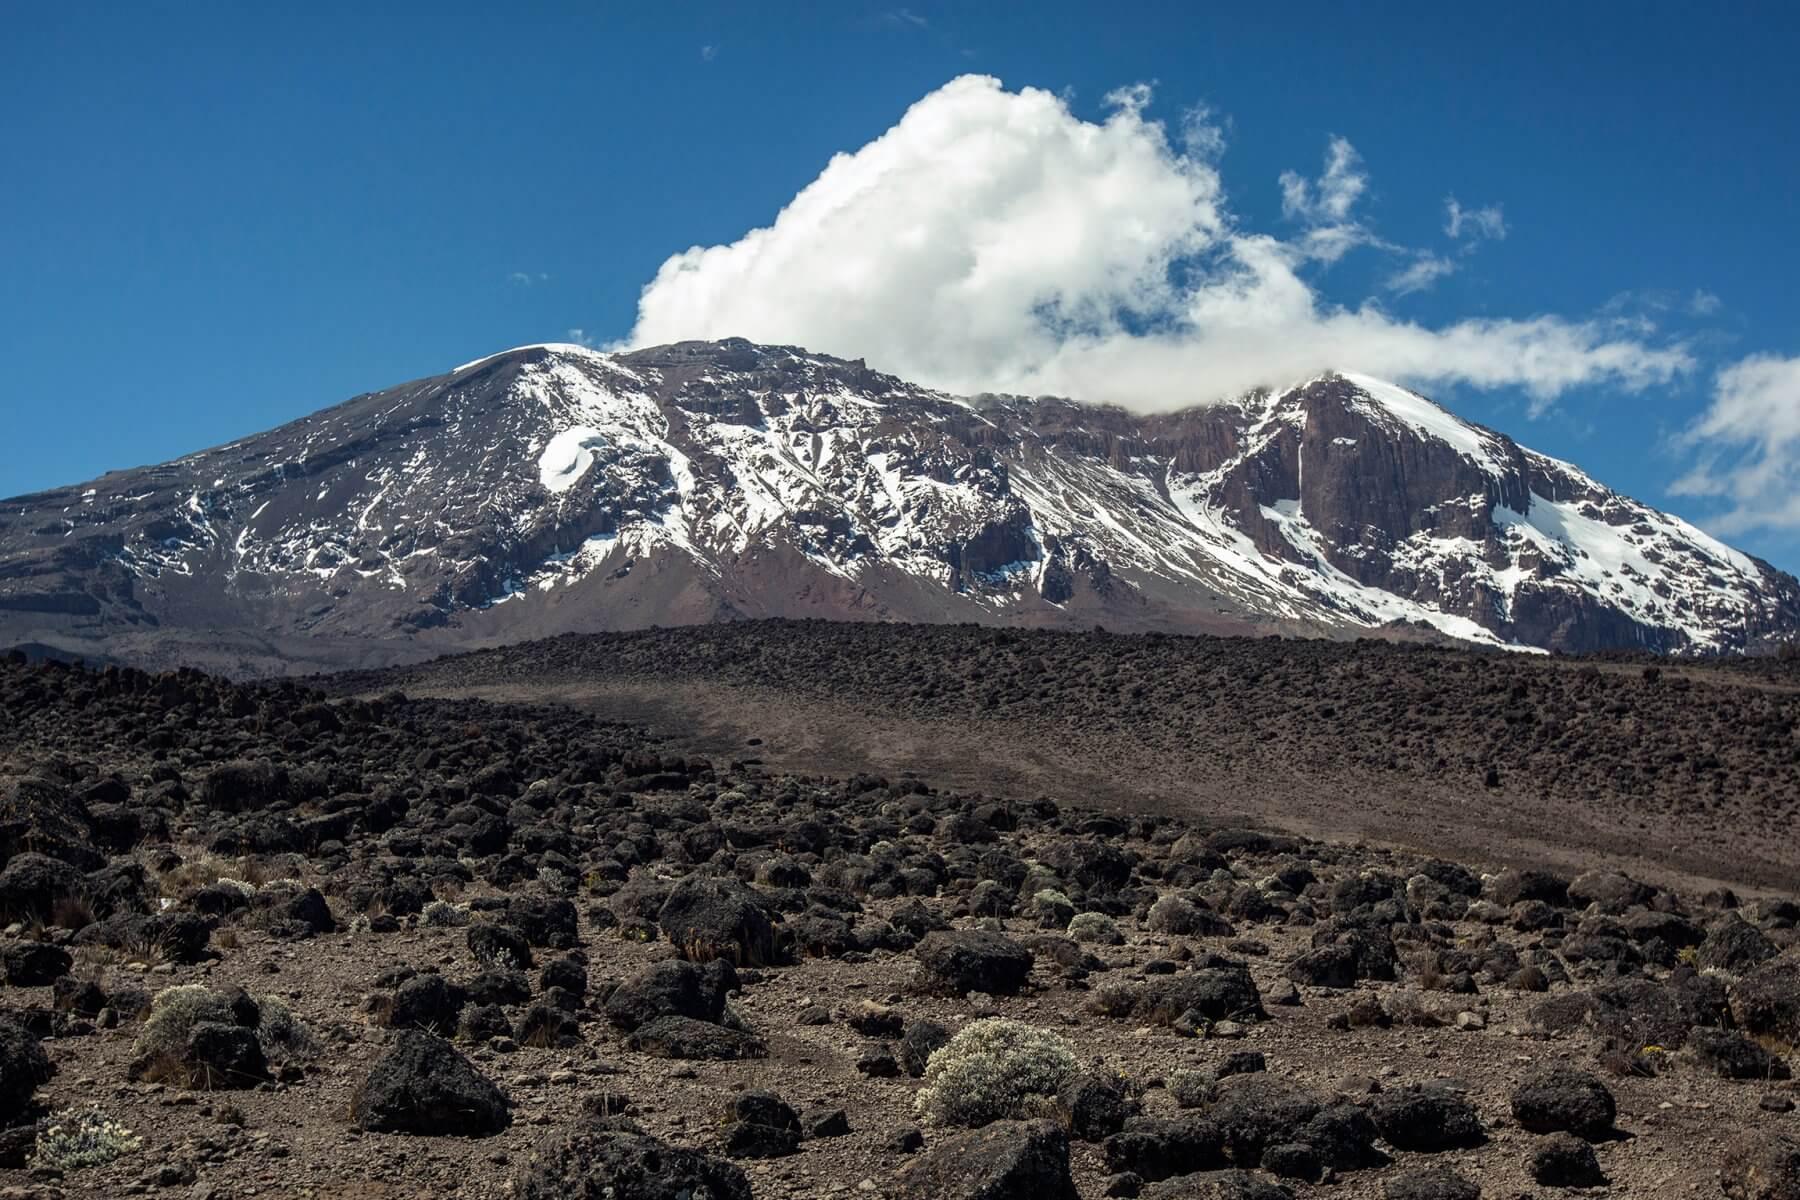 A Brief Guide for Women to Climb Kilimanjaro